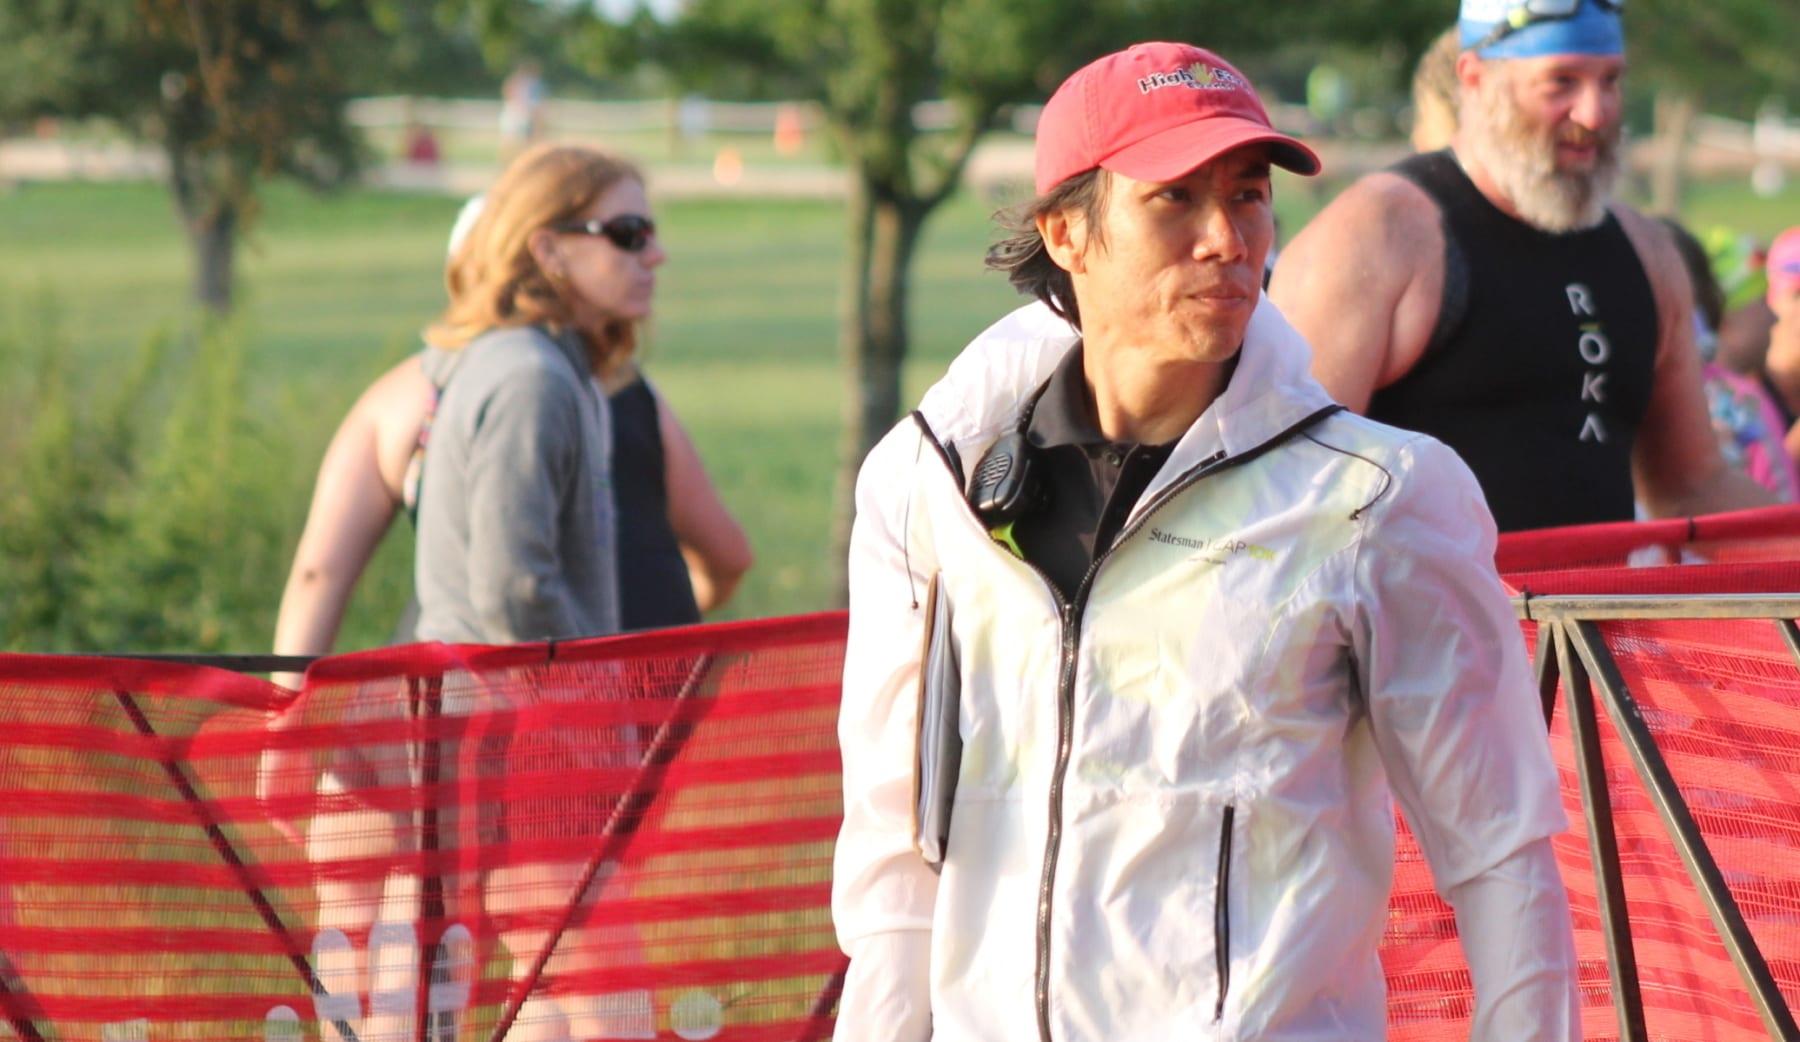 Image of John Chung at Rookie Triathlon.